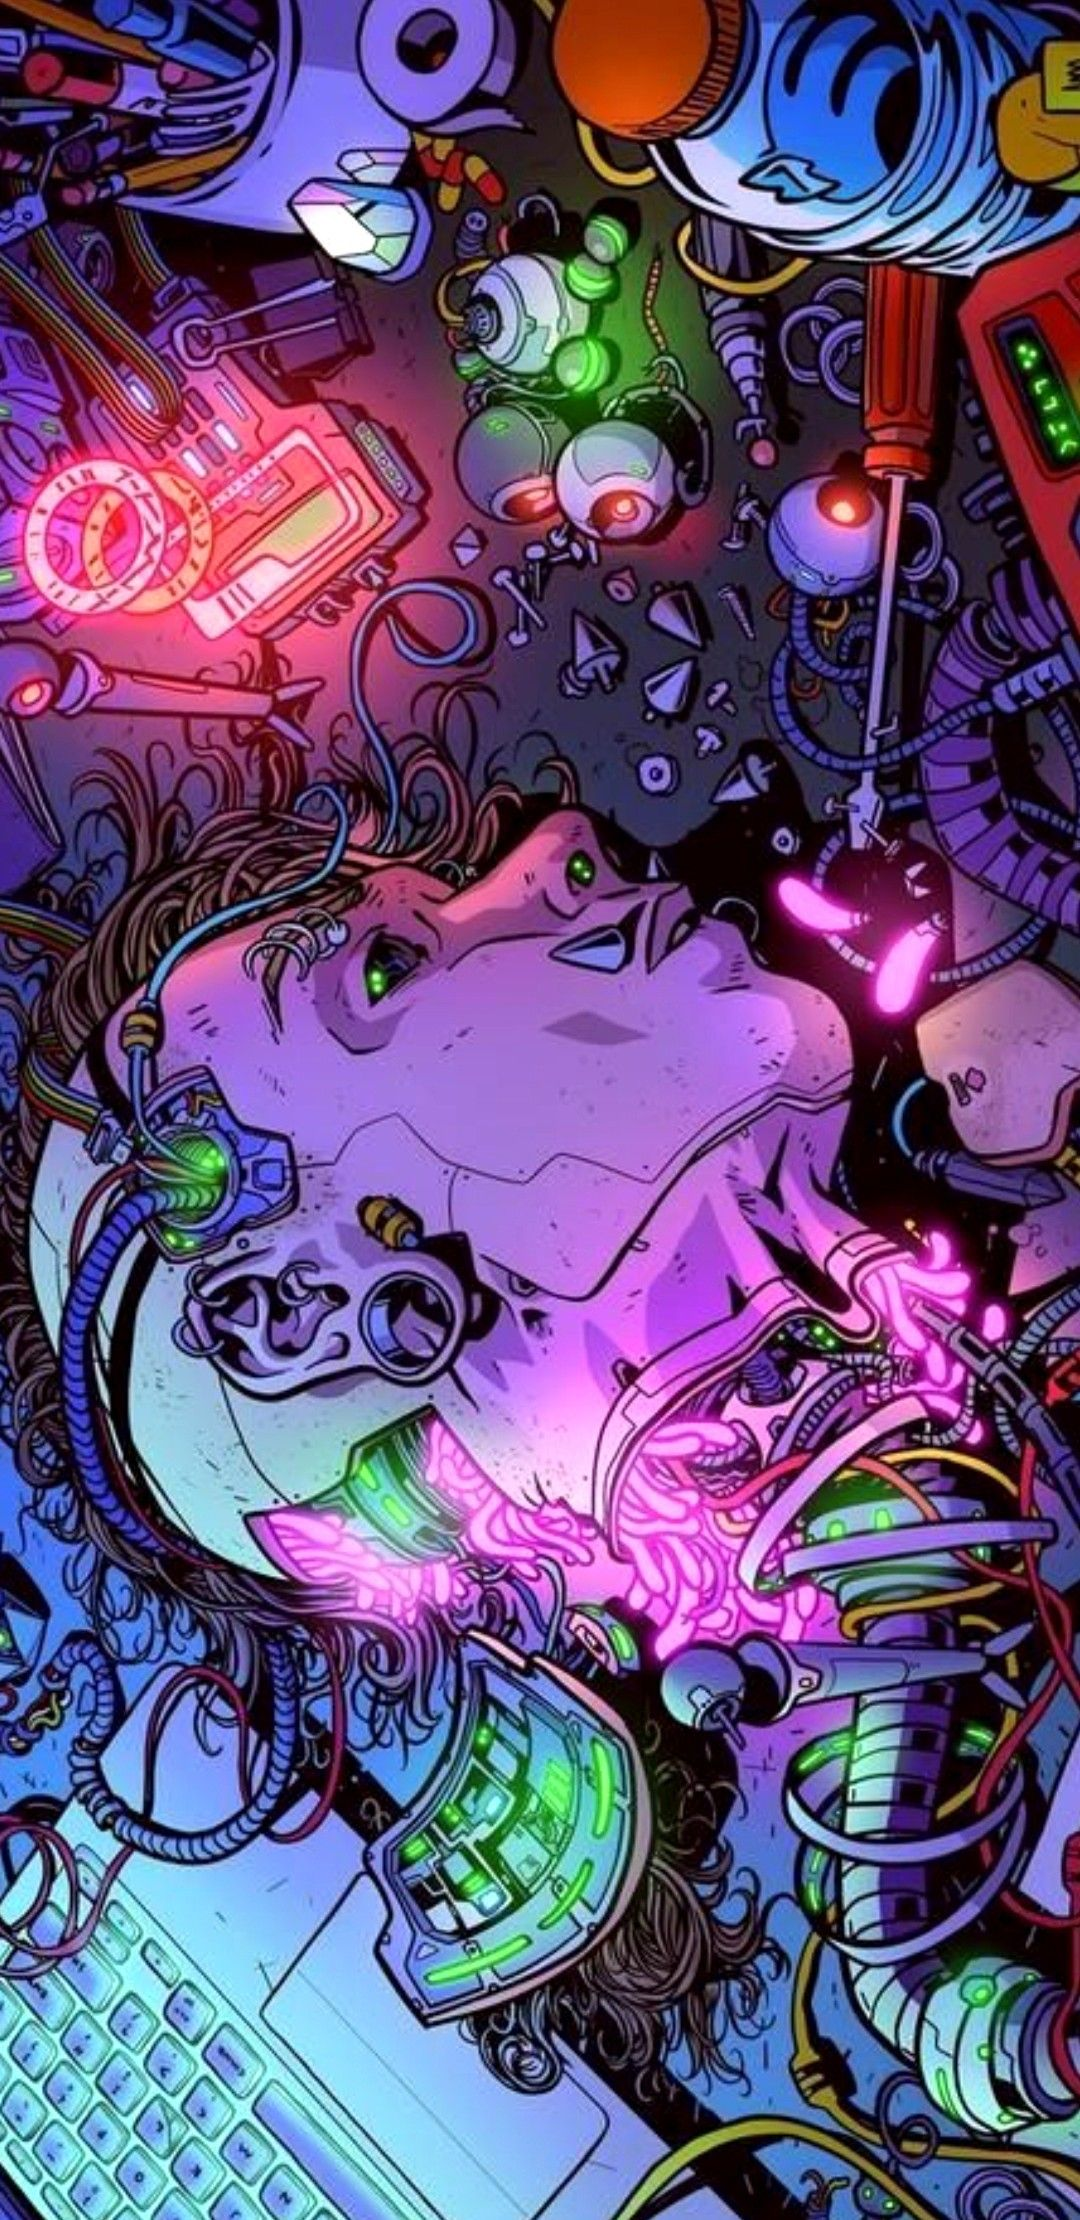 Pin By Teodora On Ariadna In 2020 Cyberpunk Art Psychedelic Art